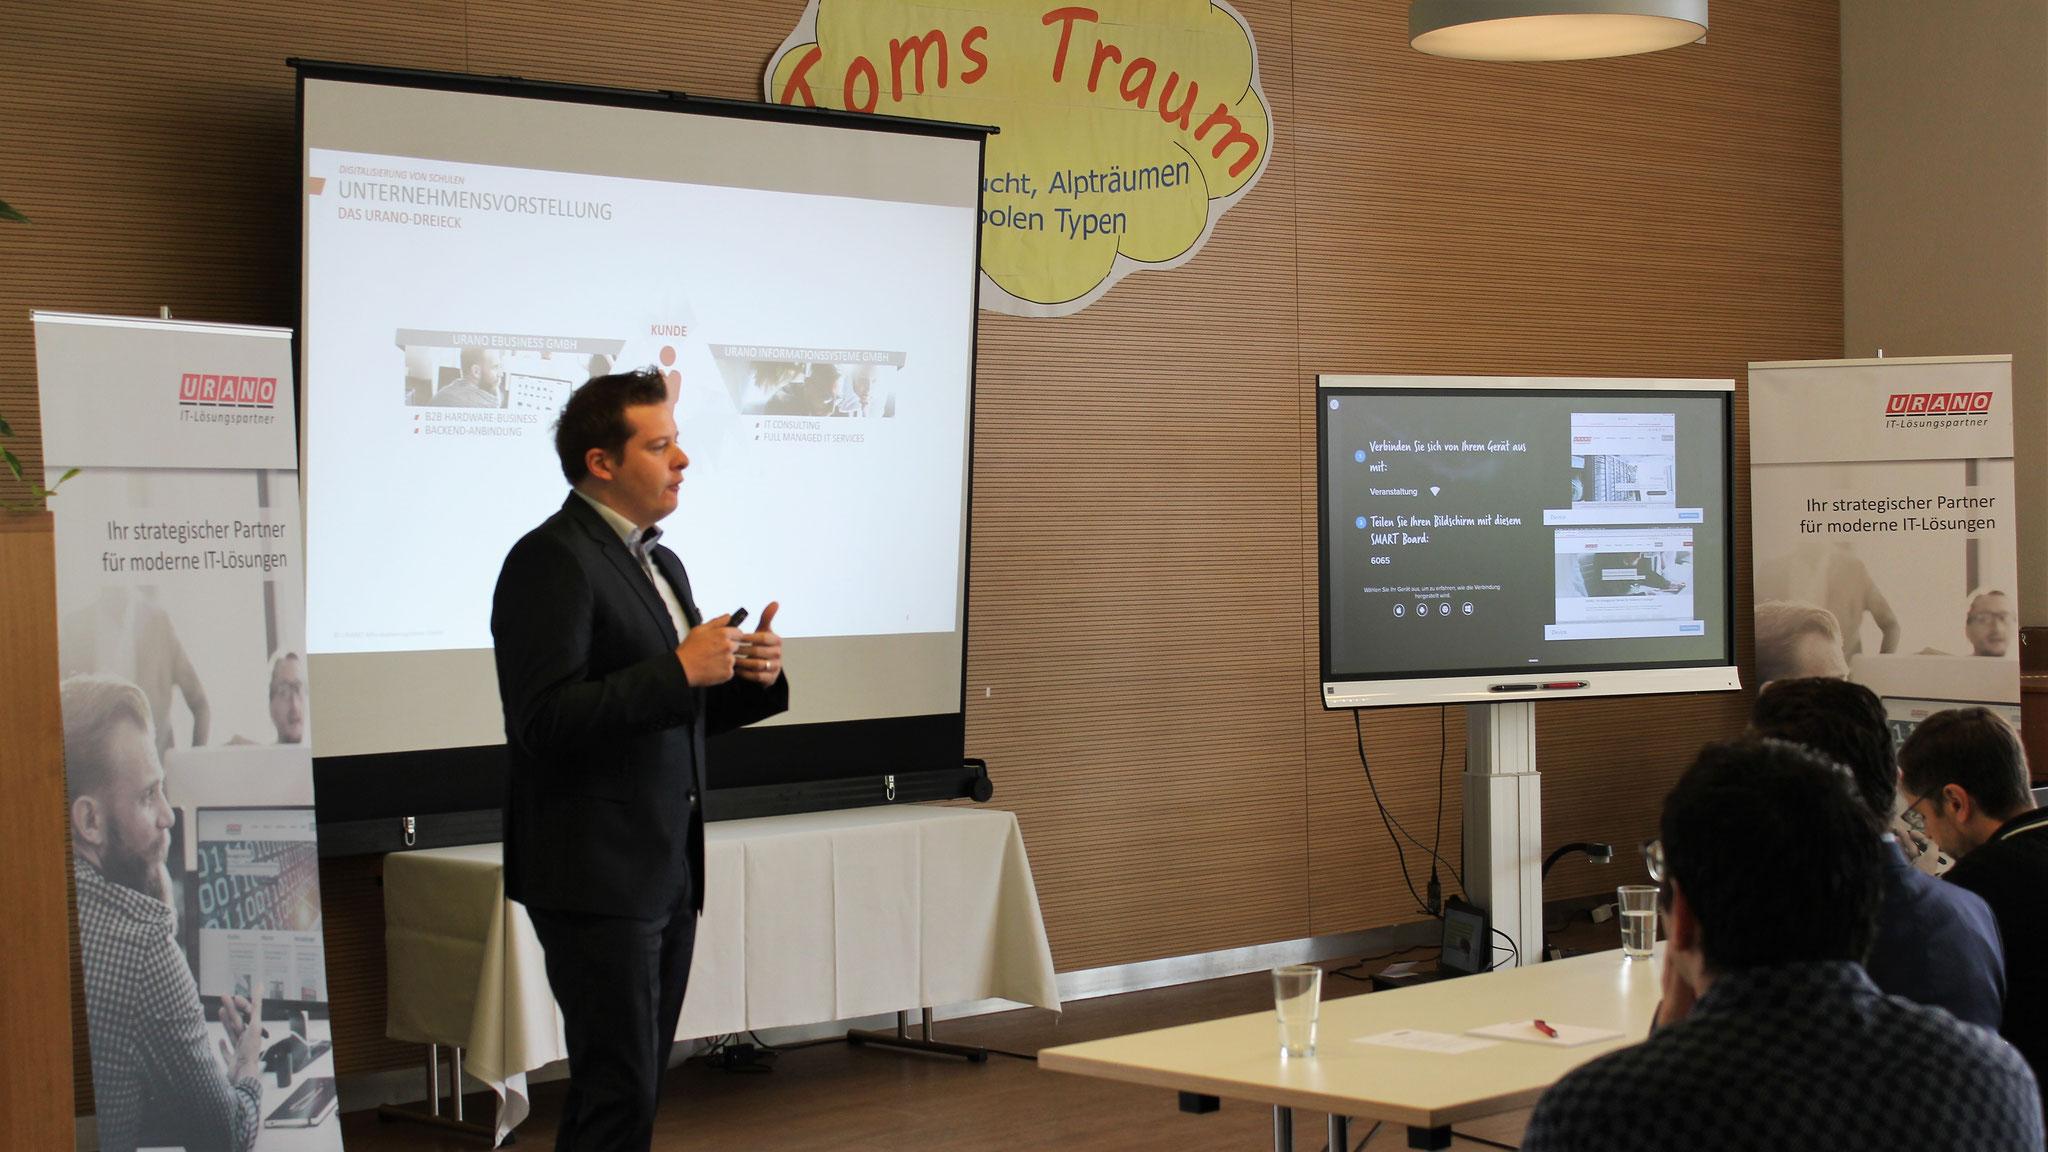 Chief Operating Officer Sebastian Schmalenbach begrüßt Lehrer und Schulträger